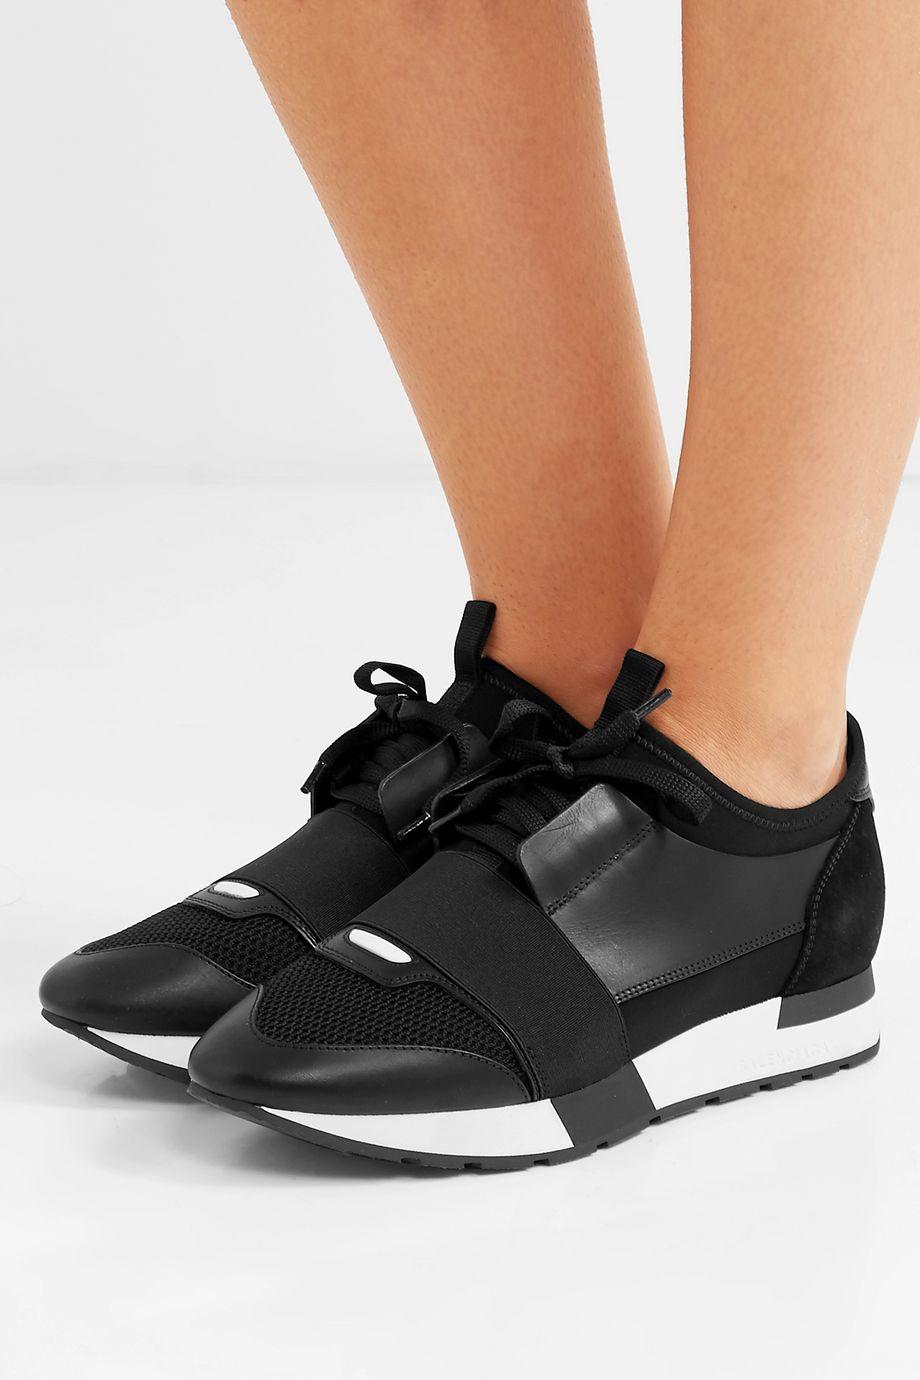 Balenciaga Race Runner leather, mesh and neoprene sneakers